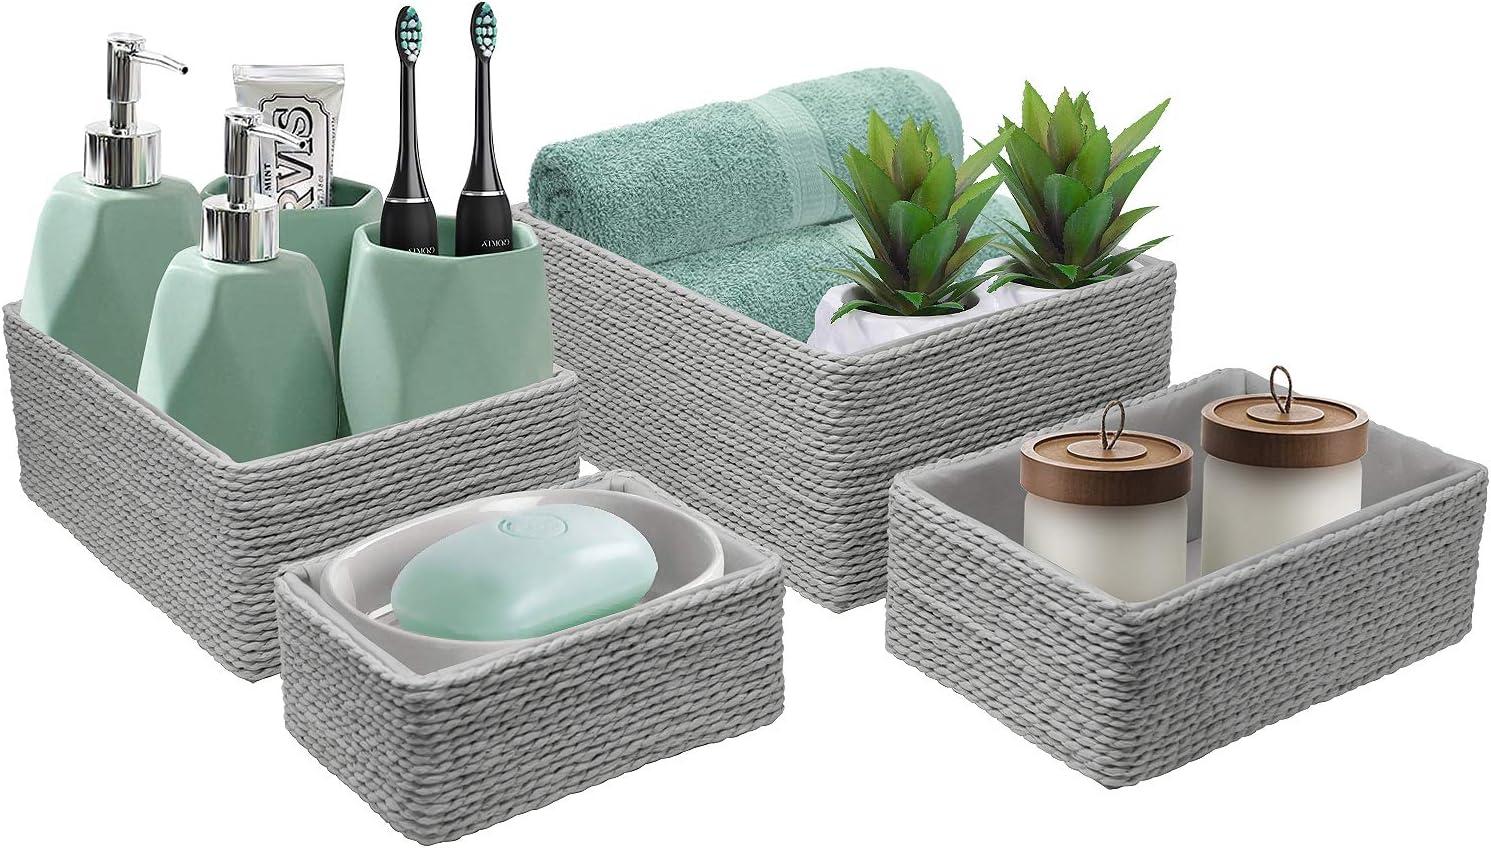 Sorbus Storage Baskets 4-Piece Set Closet Gray Stackable Woven Basket Paper Rope Bin Boxes for Makeup Office Supplies Bathroom Bedroom